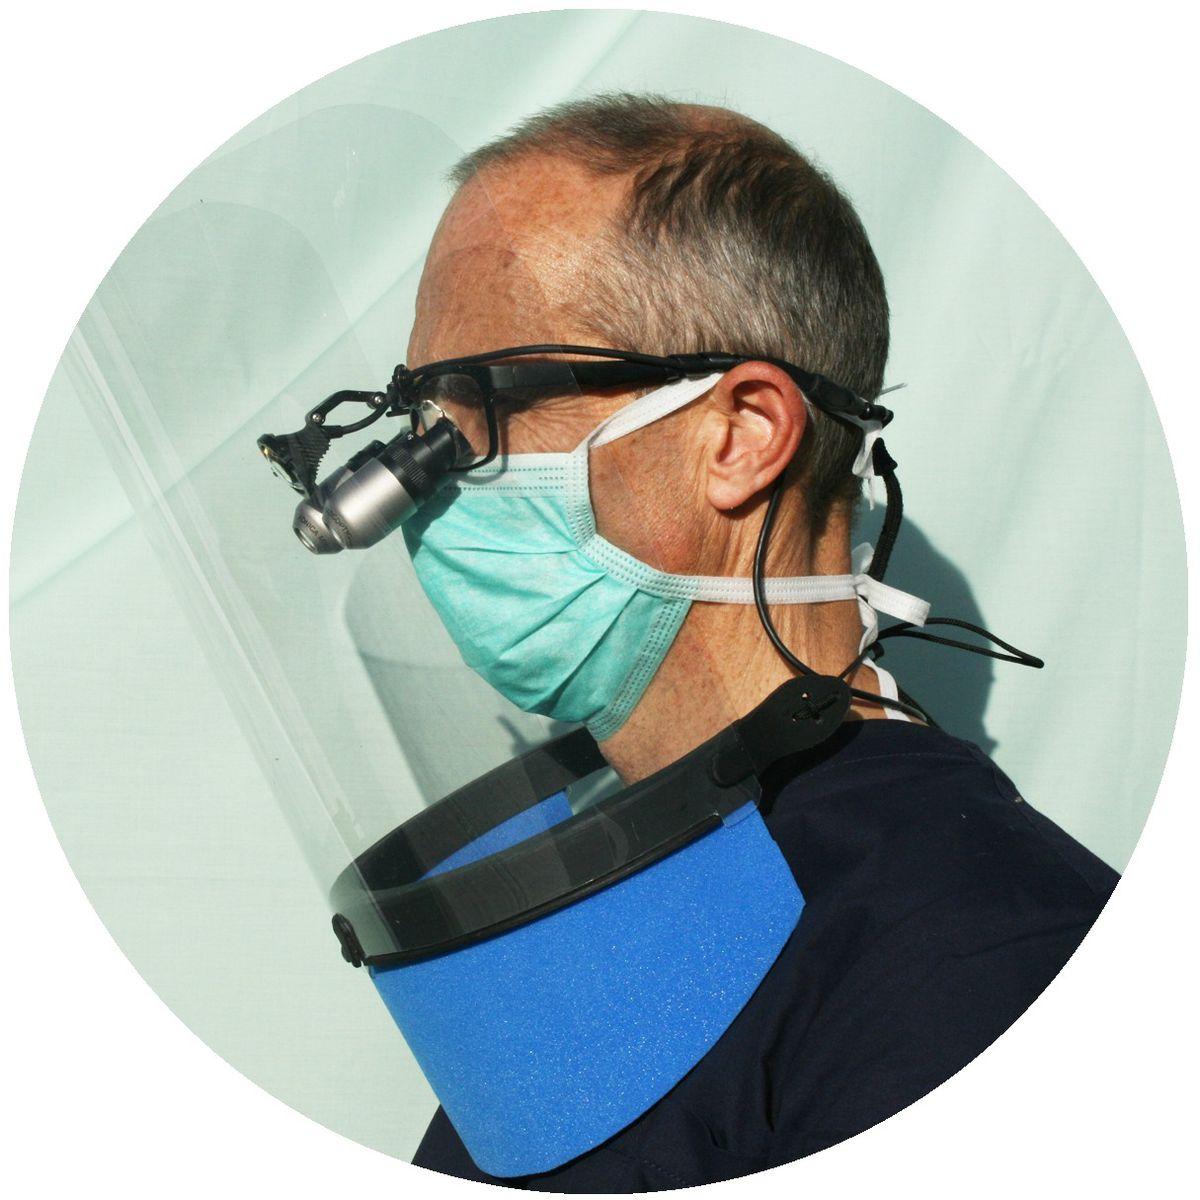 Richard Howarth wearing the Provizage visor